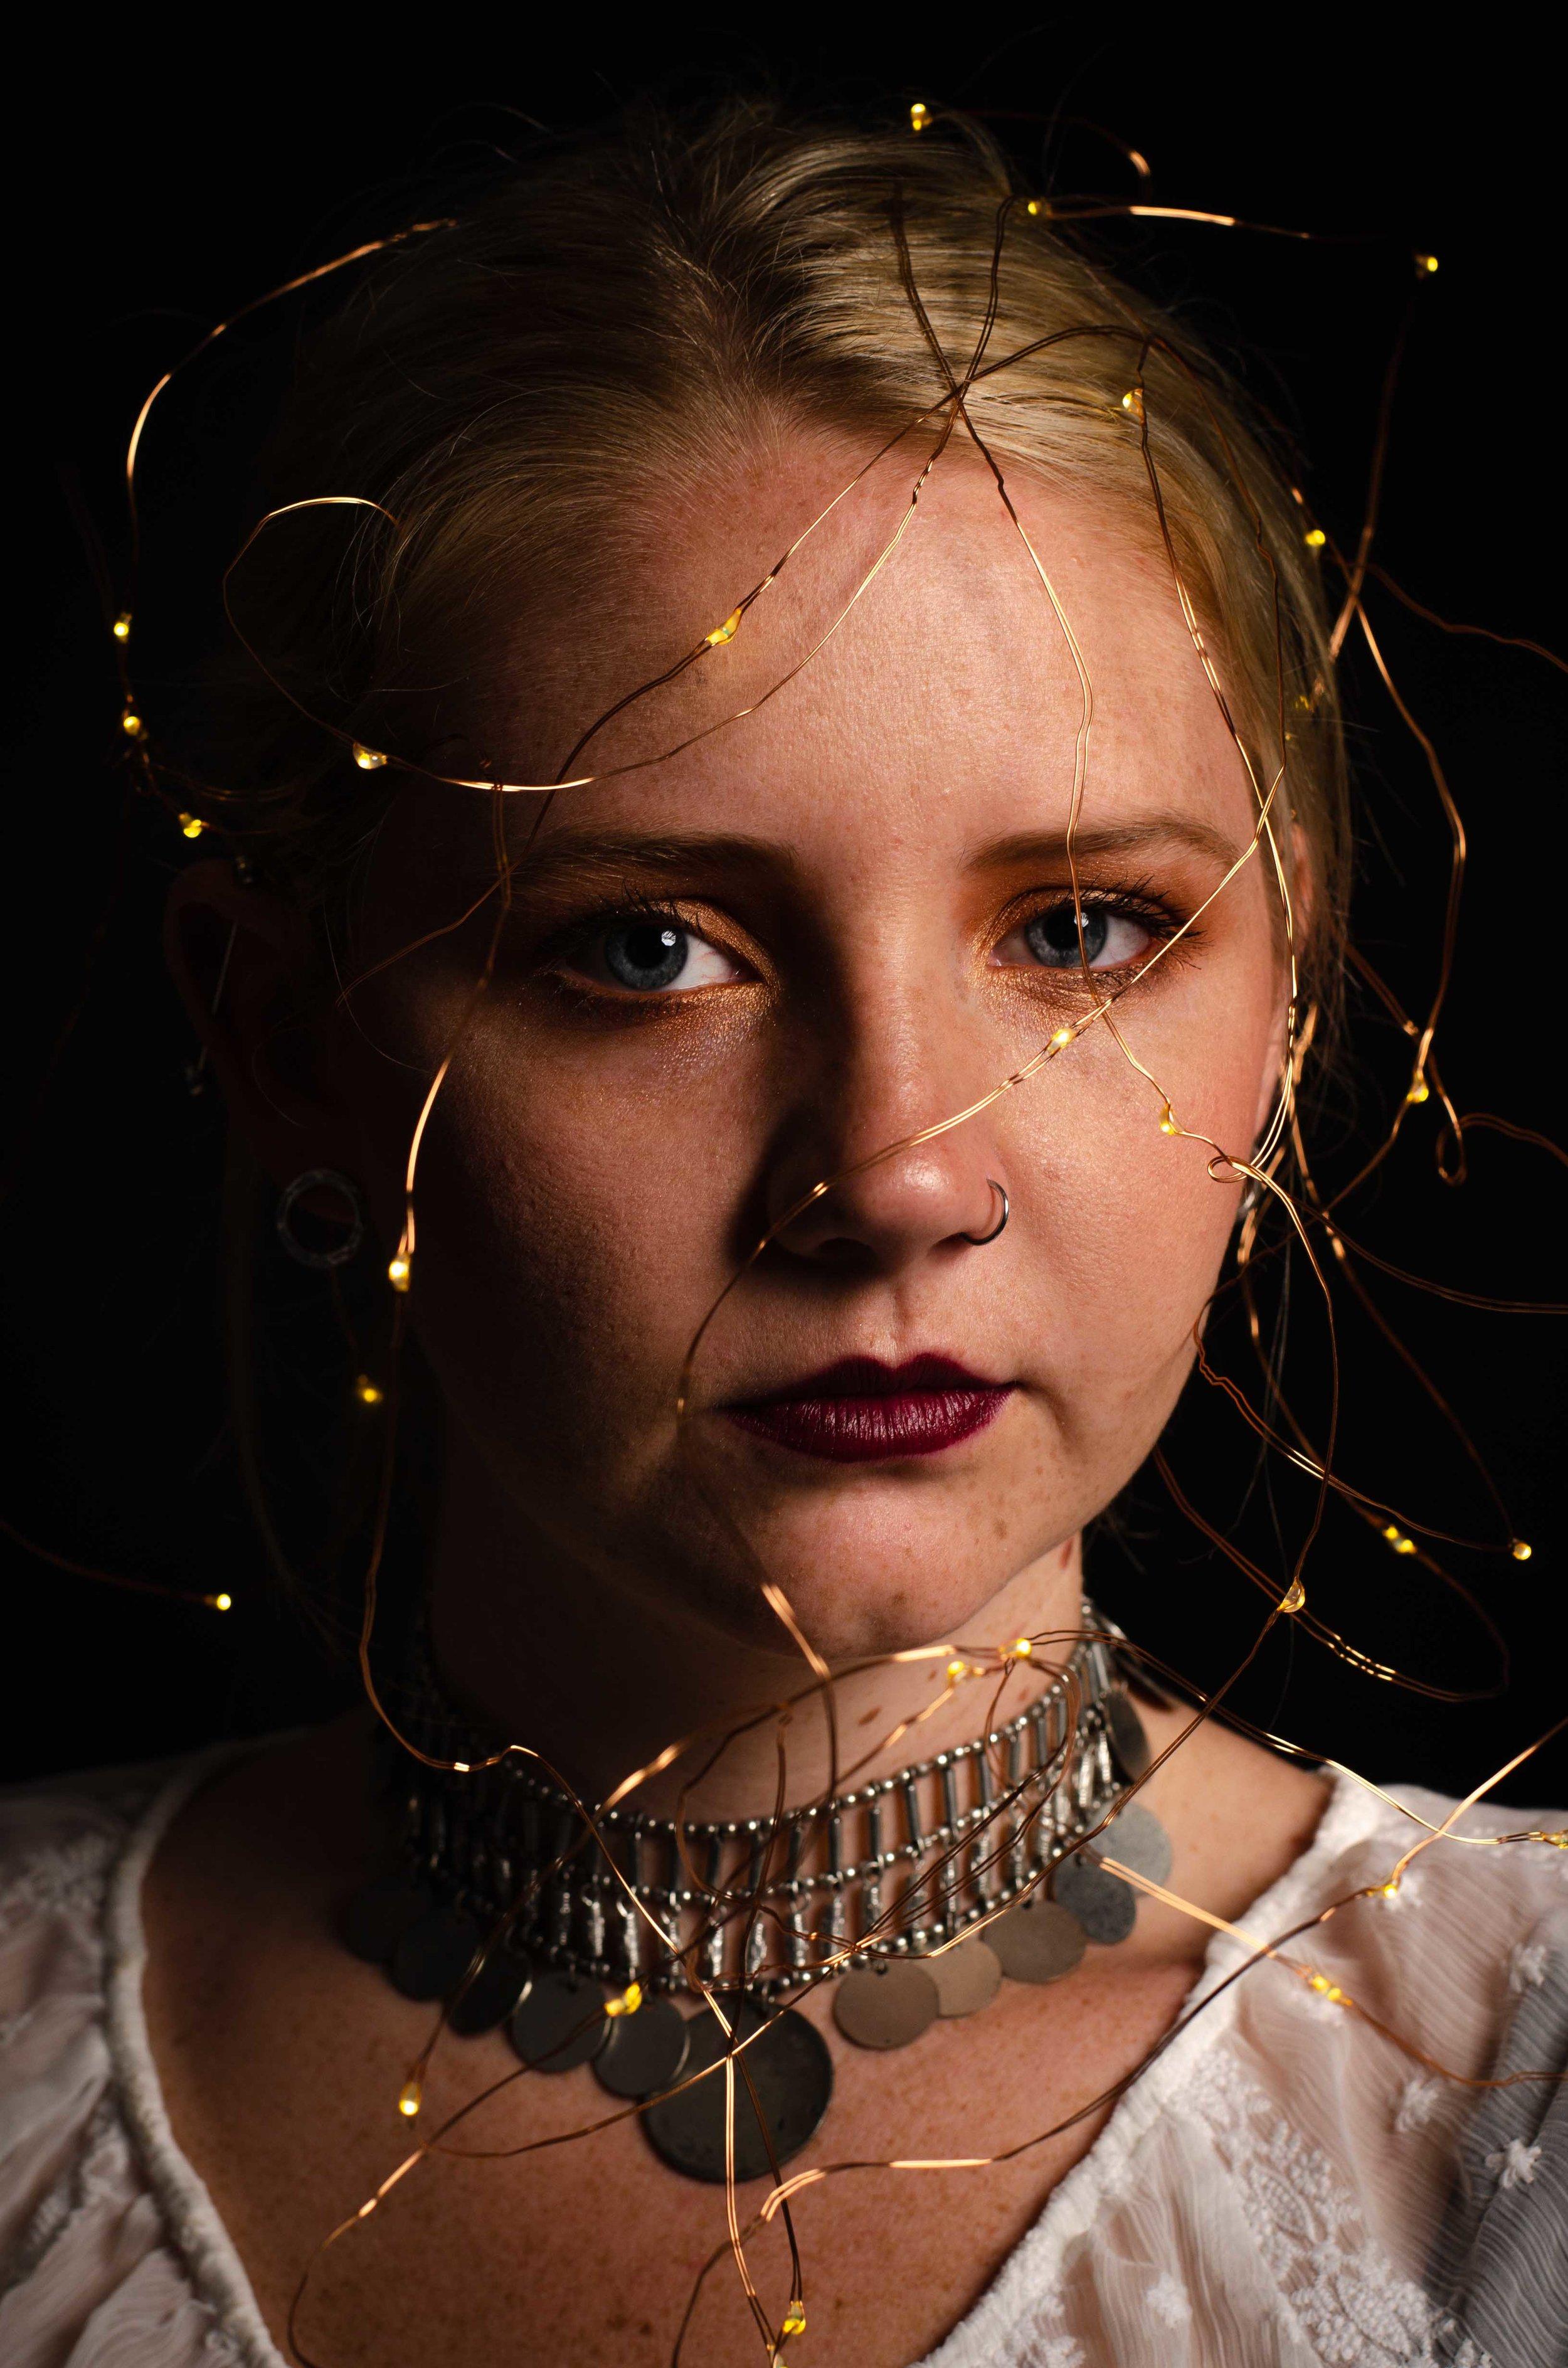 Persephone Rose - Photo by Adi Imran Kamarul Hasni